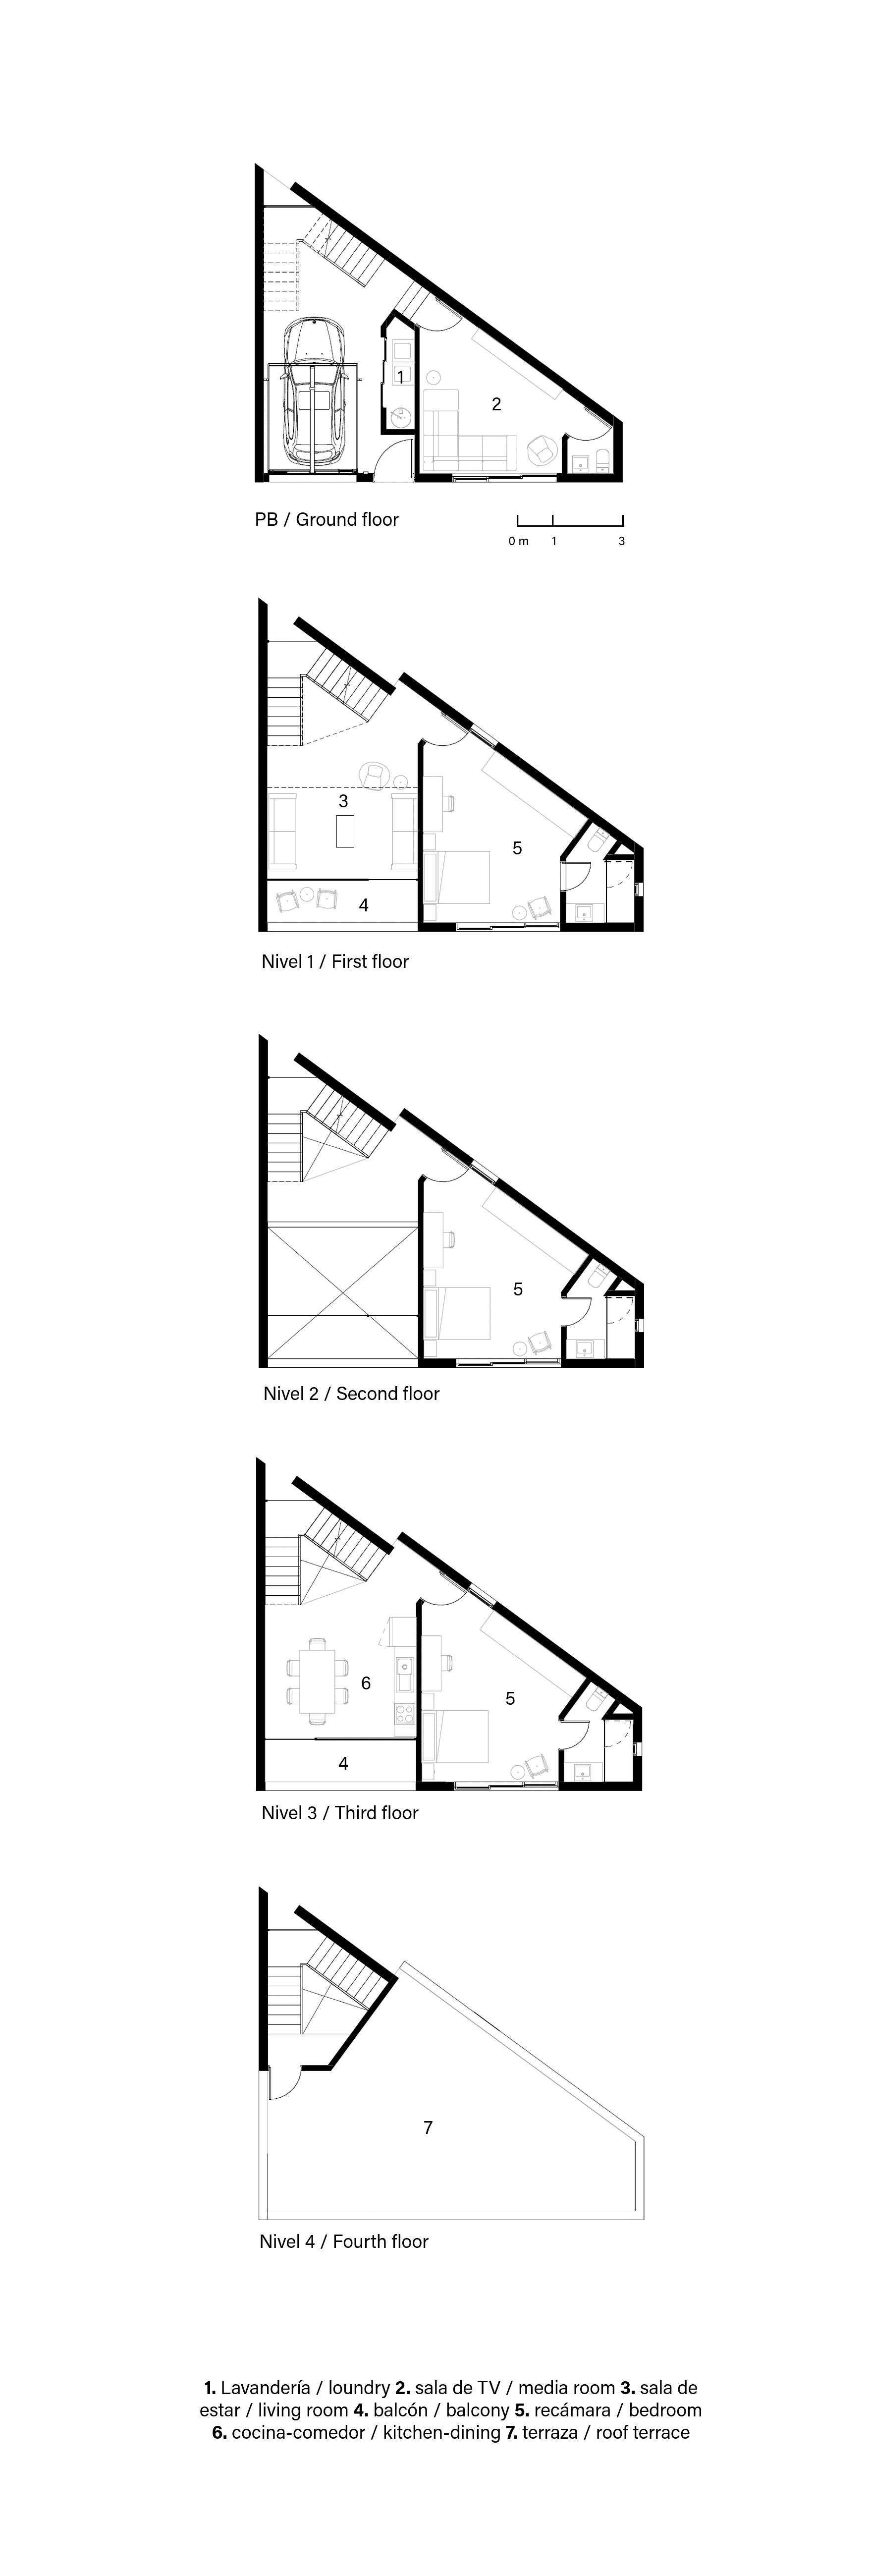 plantas tri student housing.png